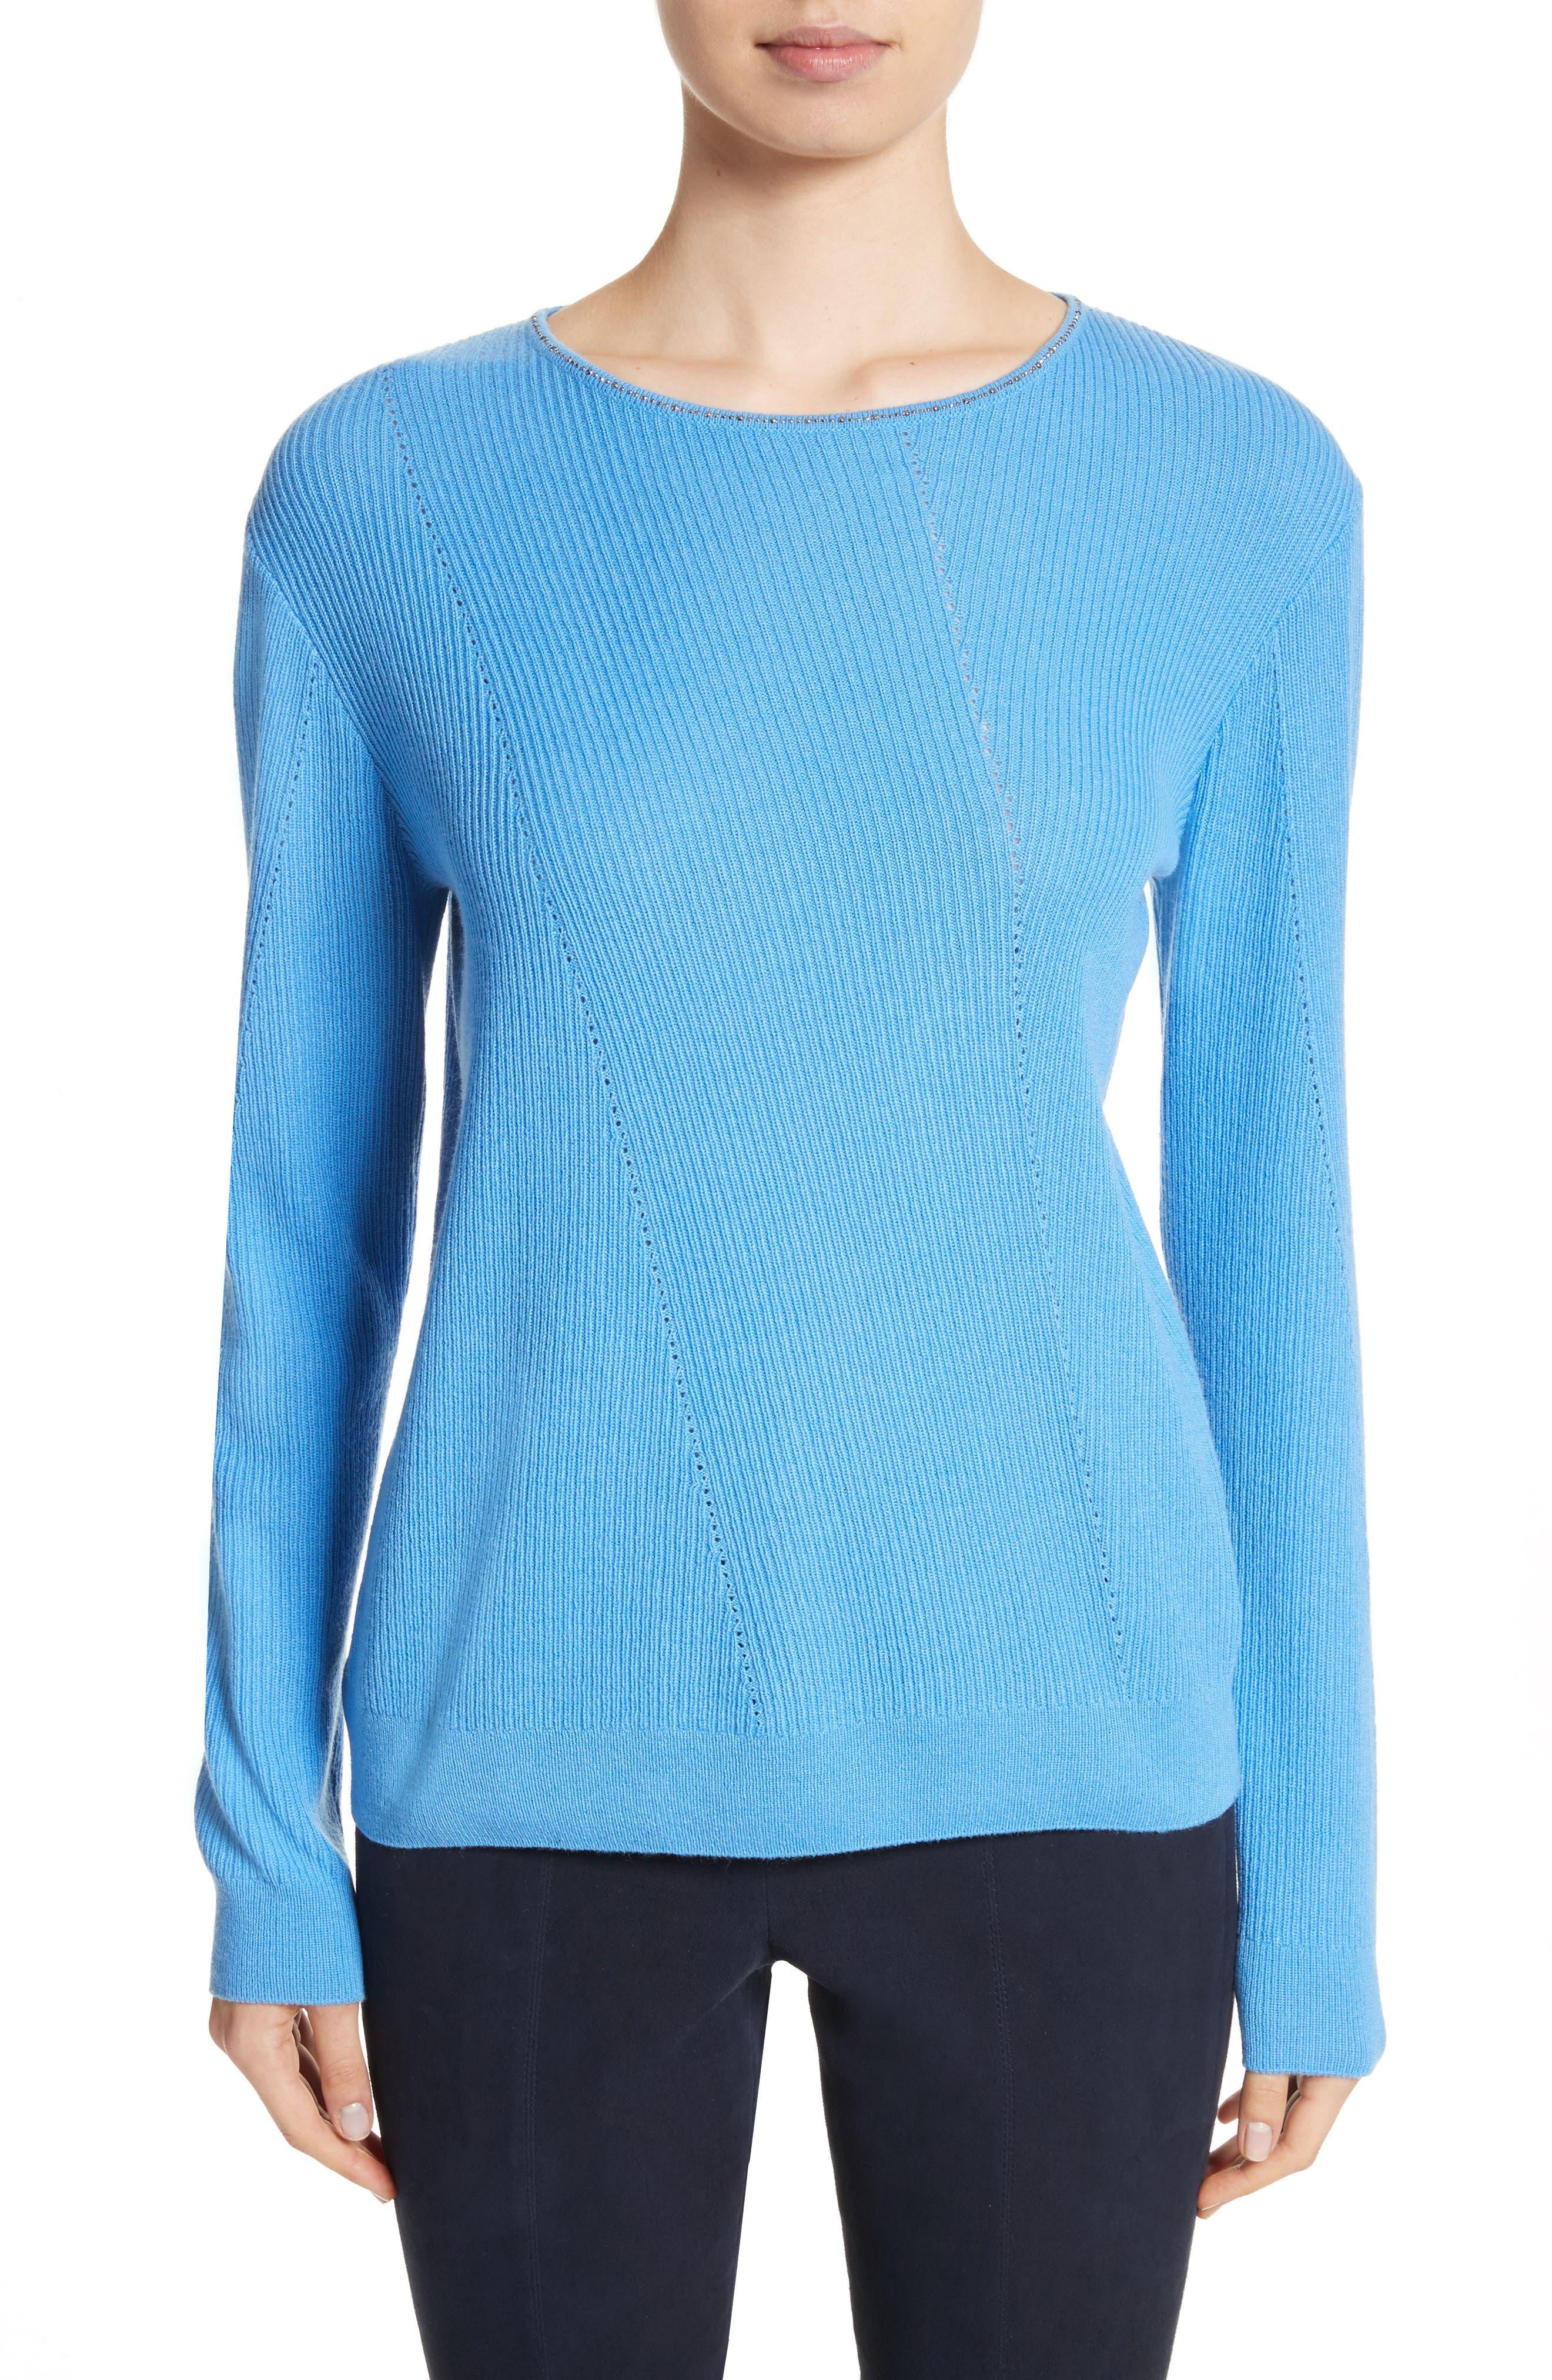 Cashmere Sweater,                         Main,                         color, Bright Niagara